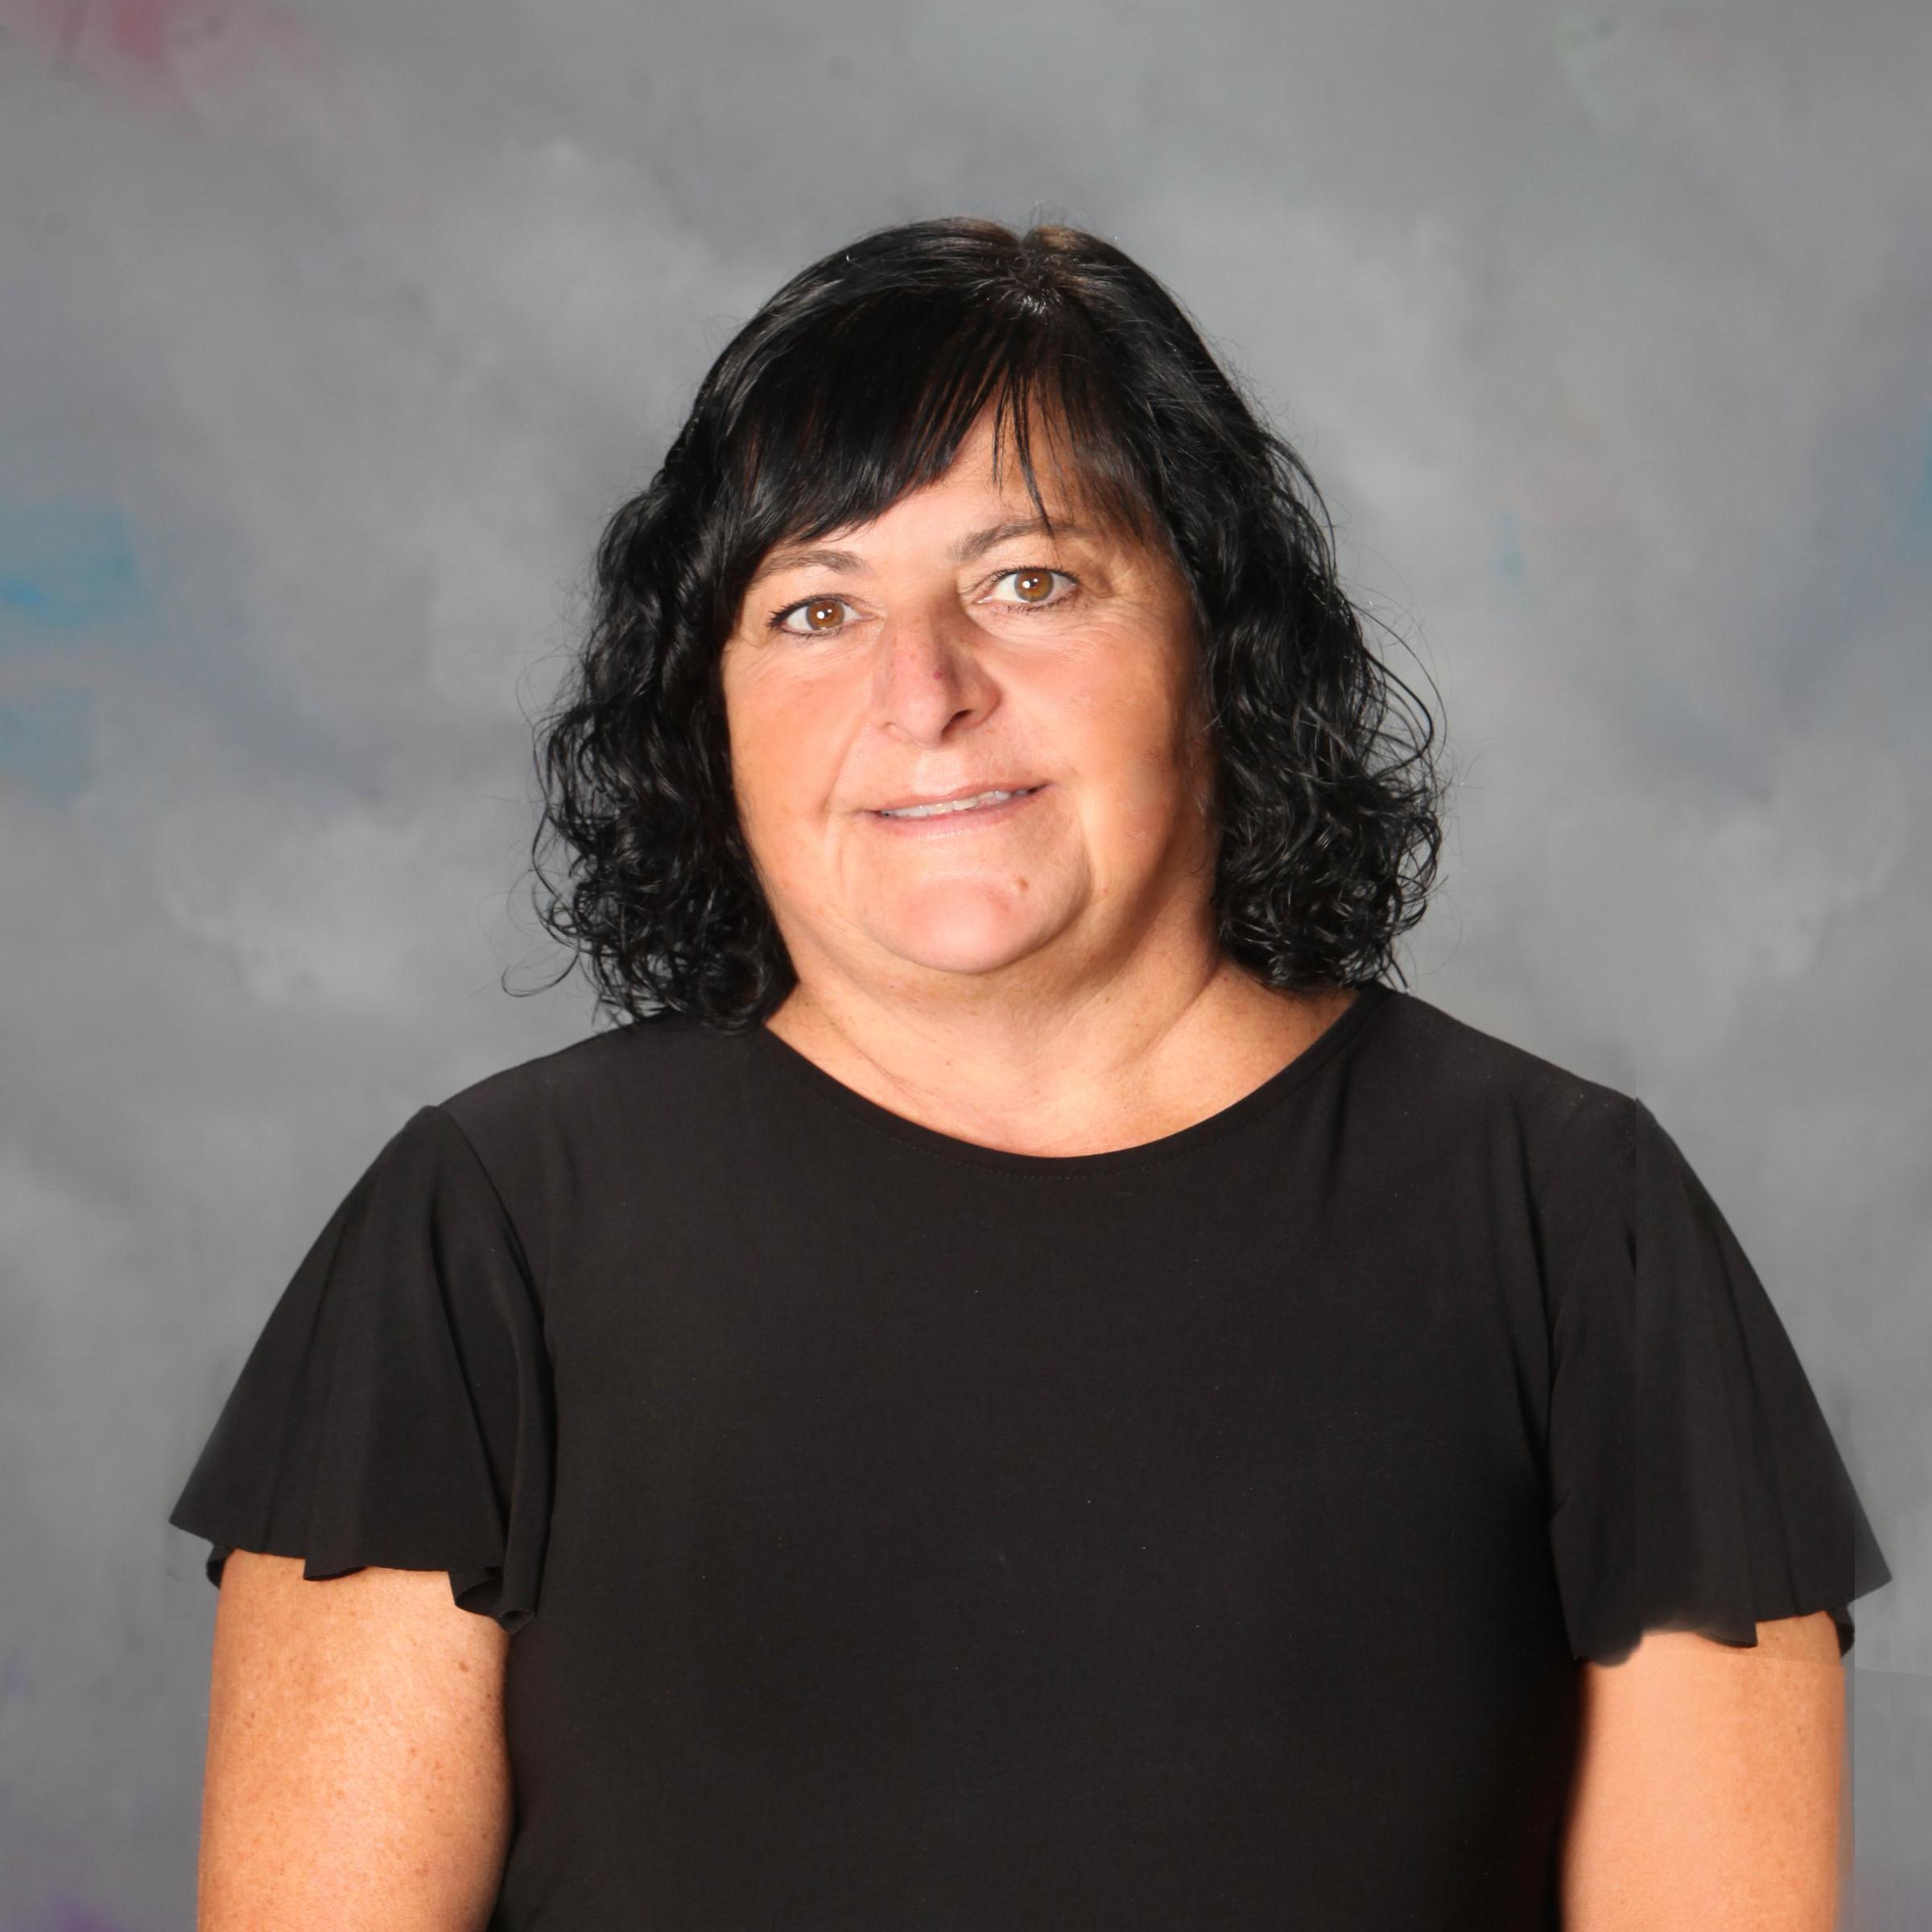 Kimberly Portser's Profile Photo